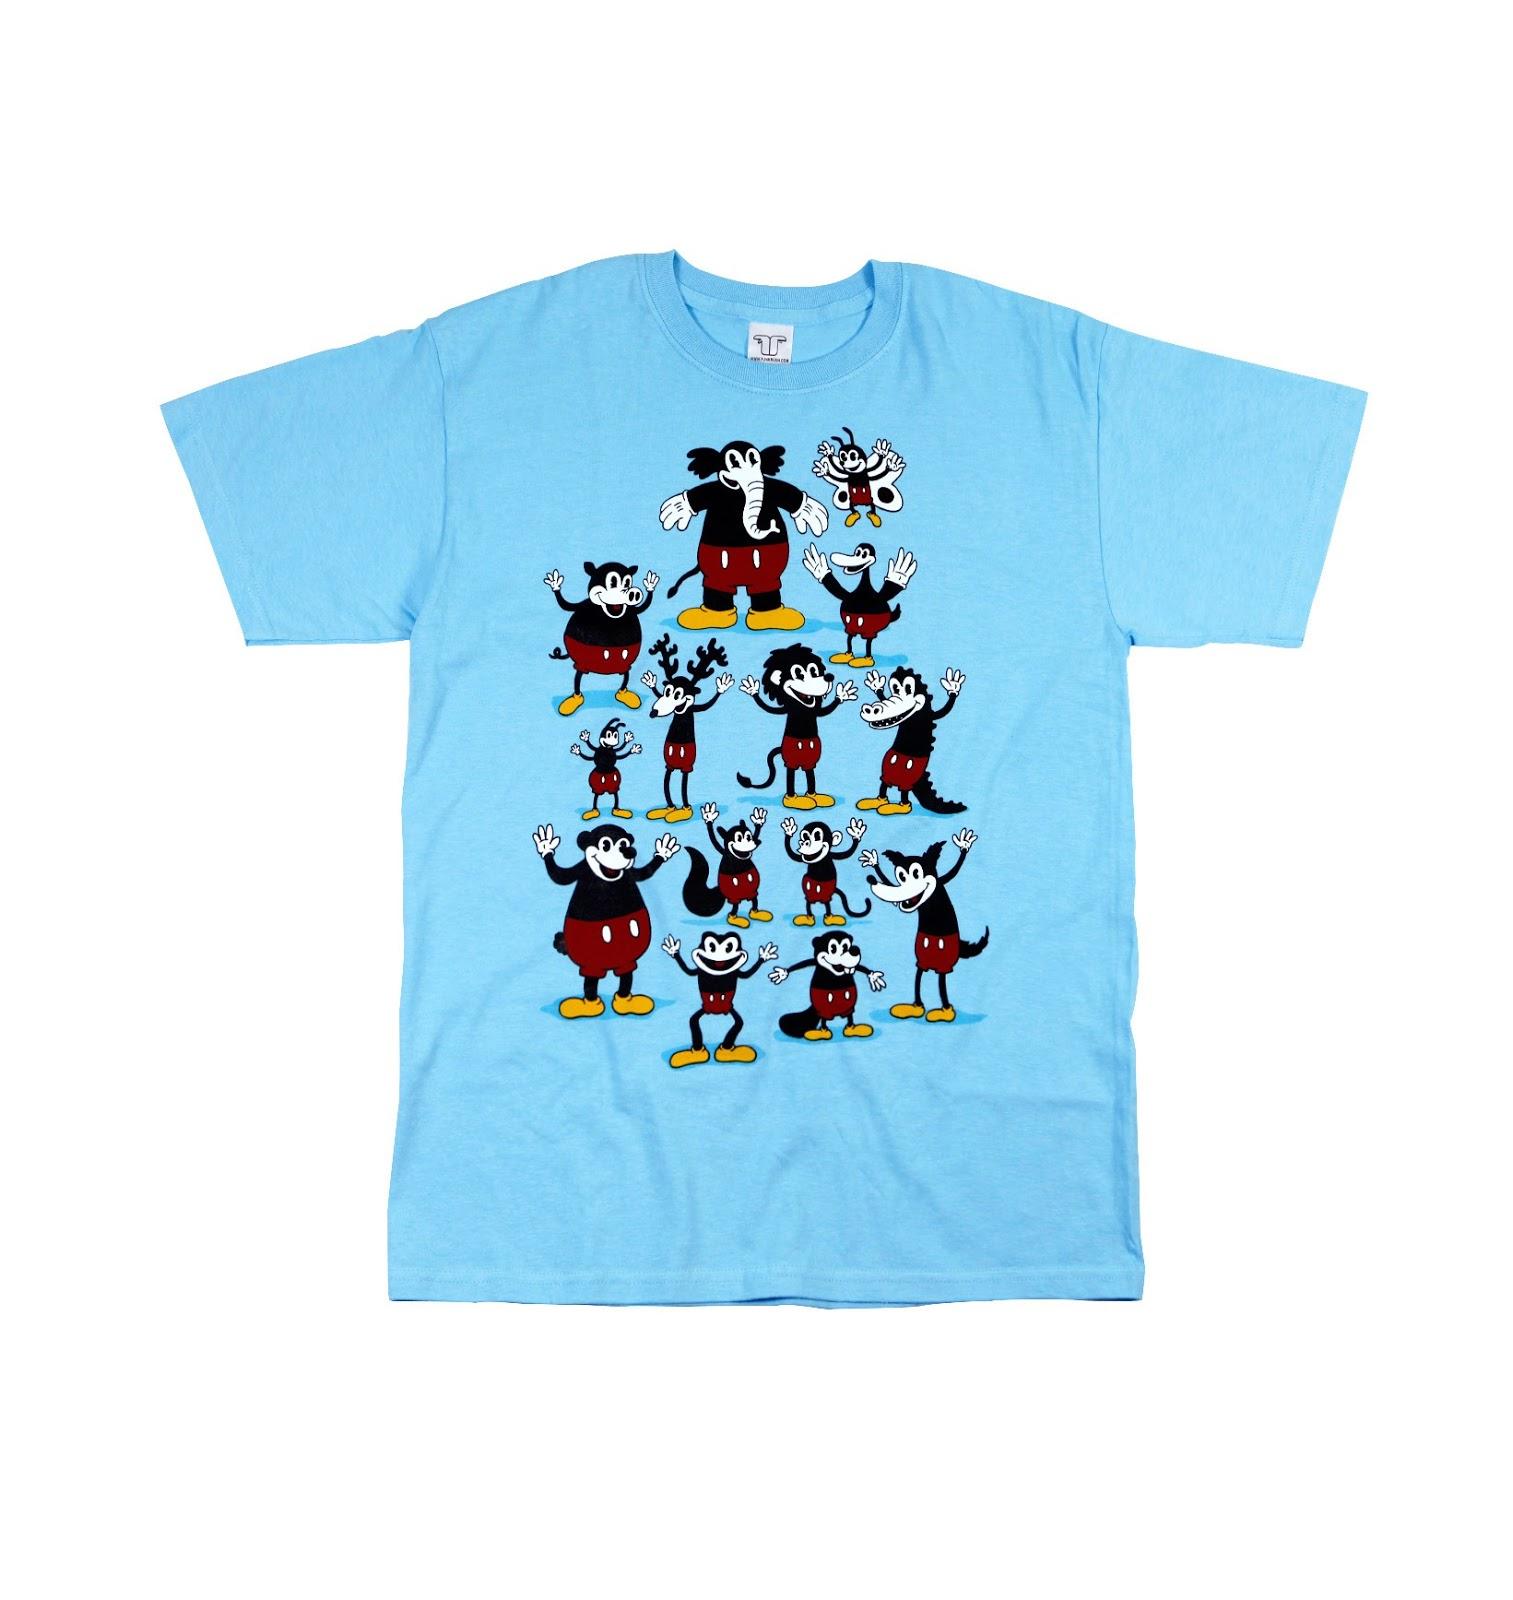 https://grafitee.es/s/camisetas/961-t-shirt-wannabees.html